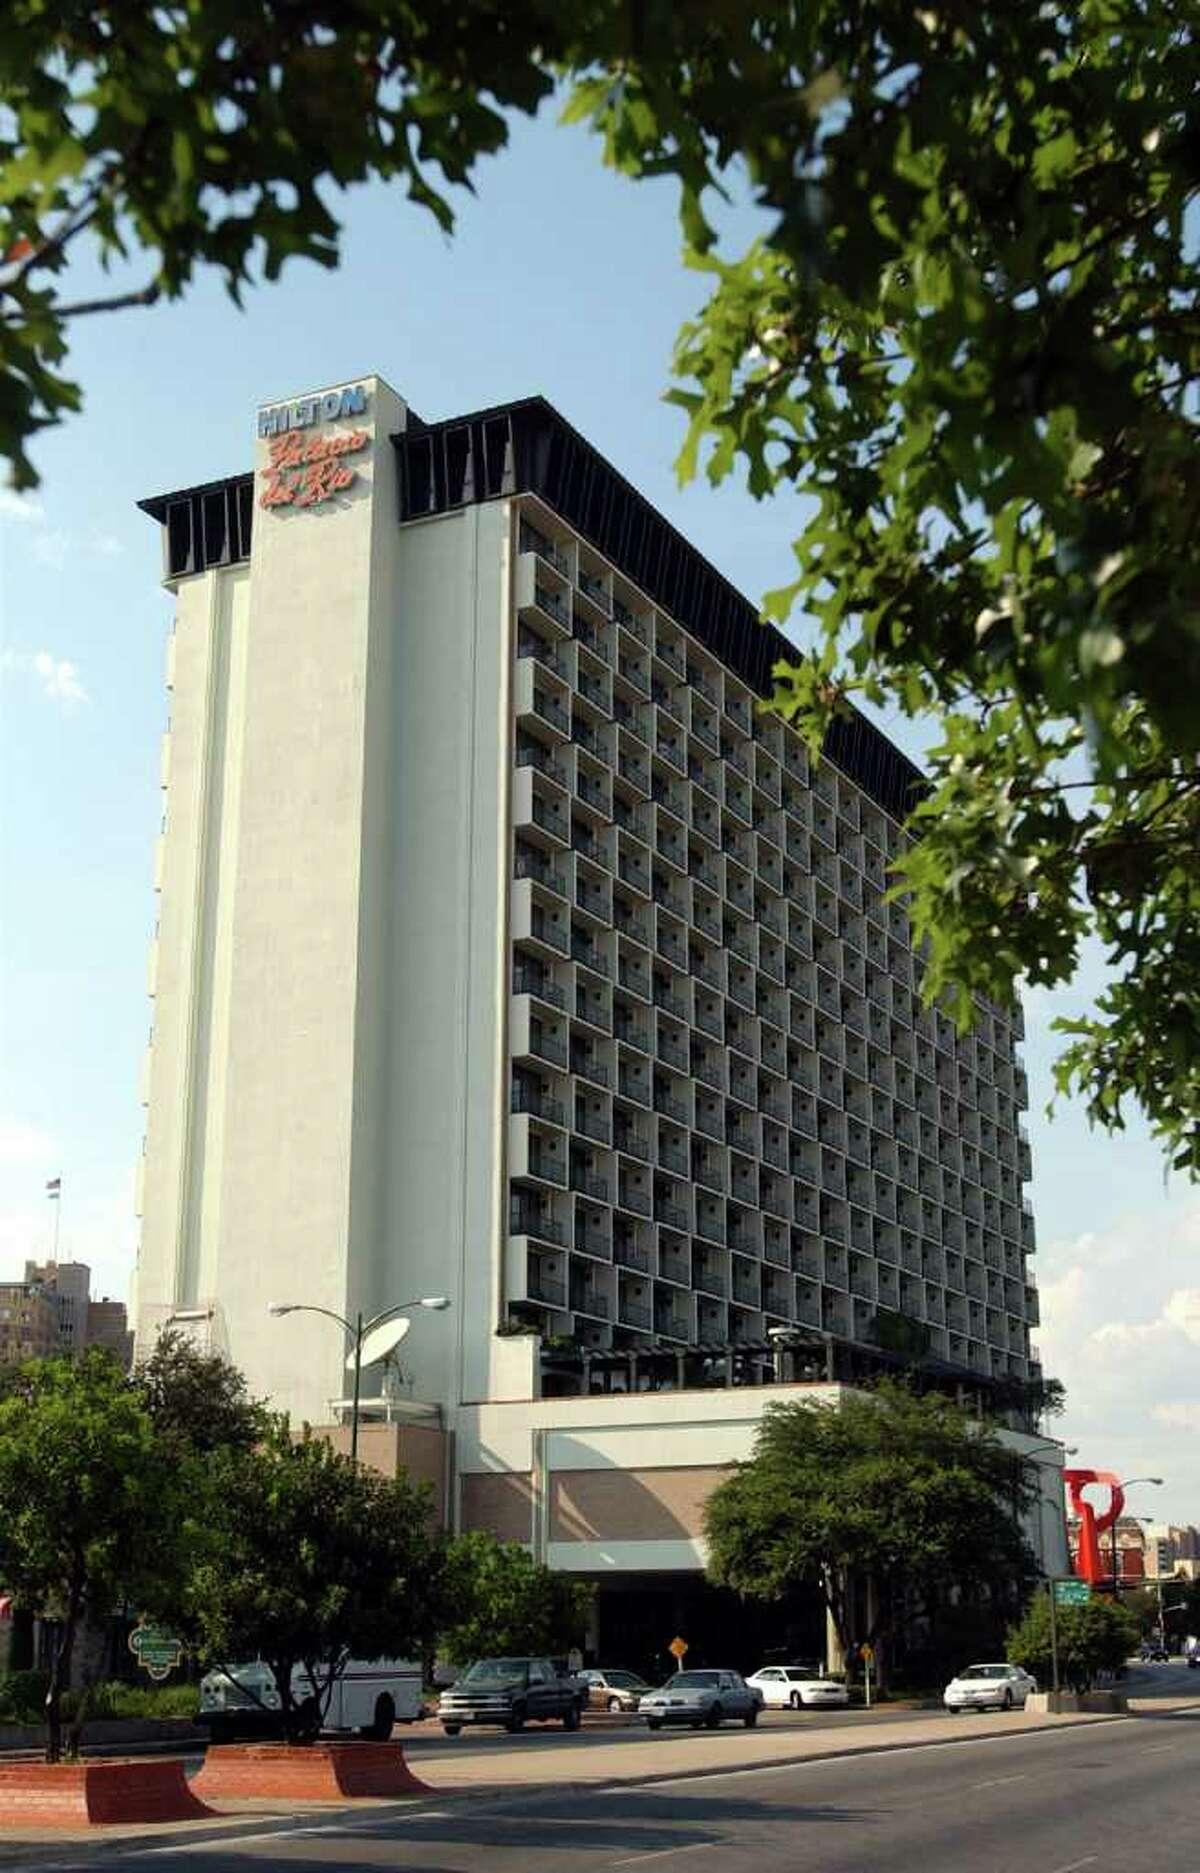 BUSINESS - Photo of the Hilton Palacio Del Rio on Wednesday, August 7, 2002. (Kin Man Hui/staff)